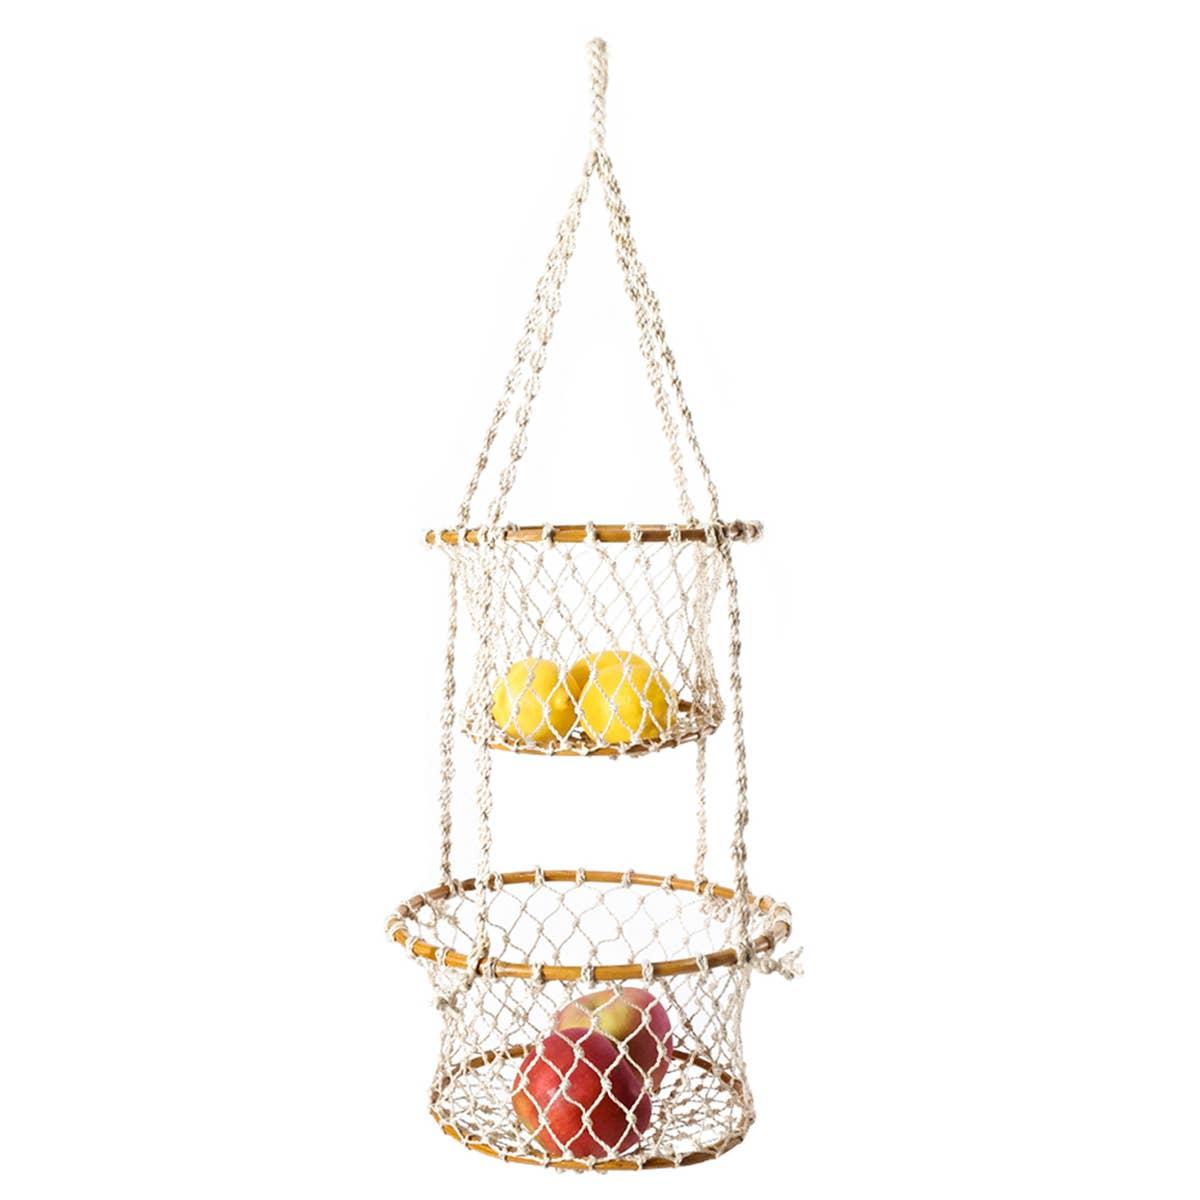 Jhuri Double Hanging Basket | Trada Marketplace